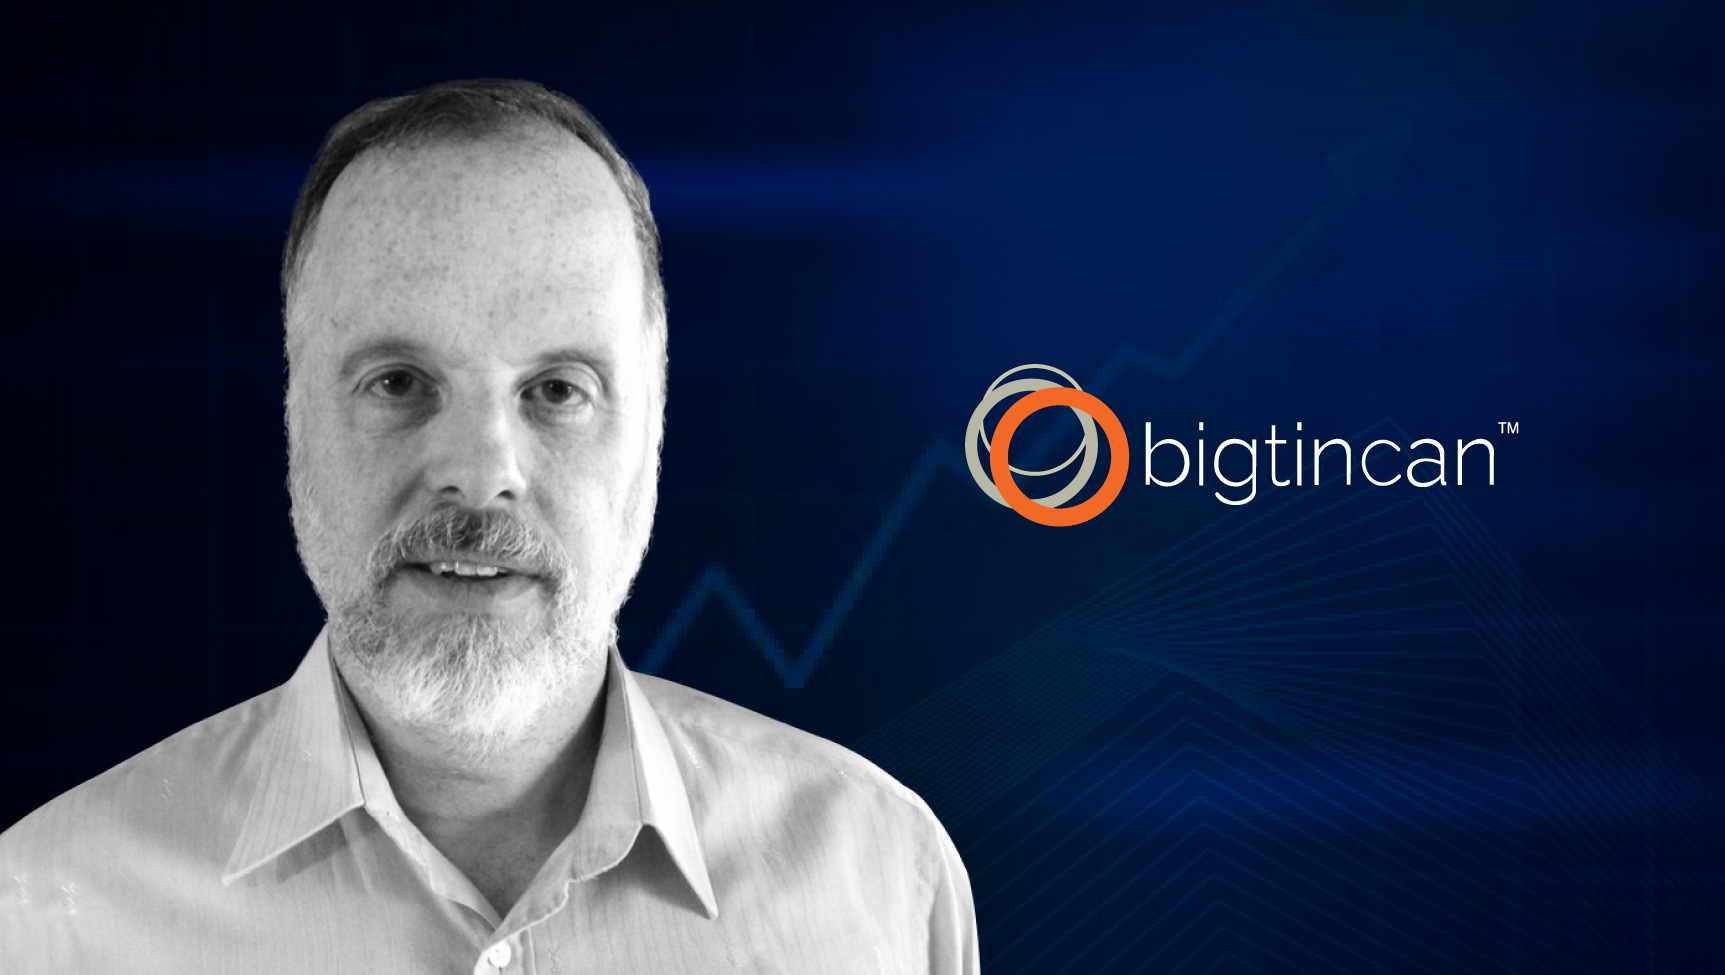 SalesTech Star Interview with John Moore, VP of Customer Success at Bigtincan